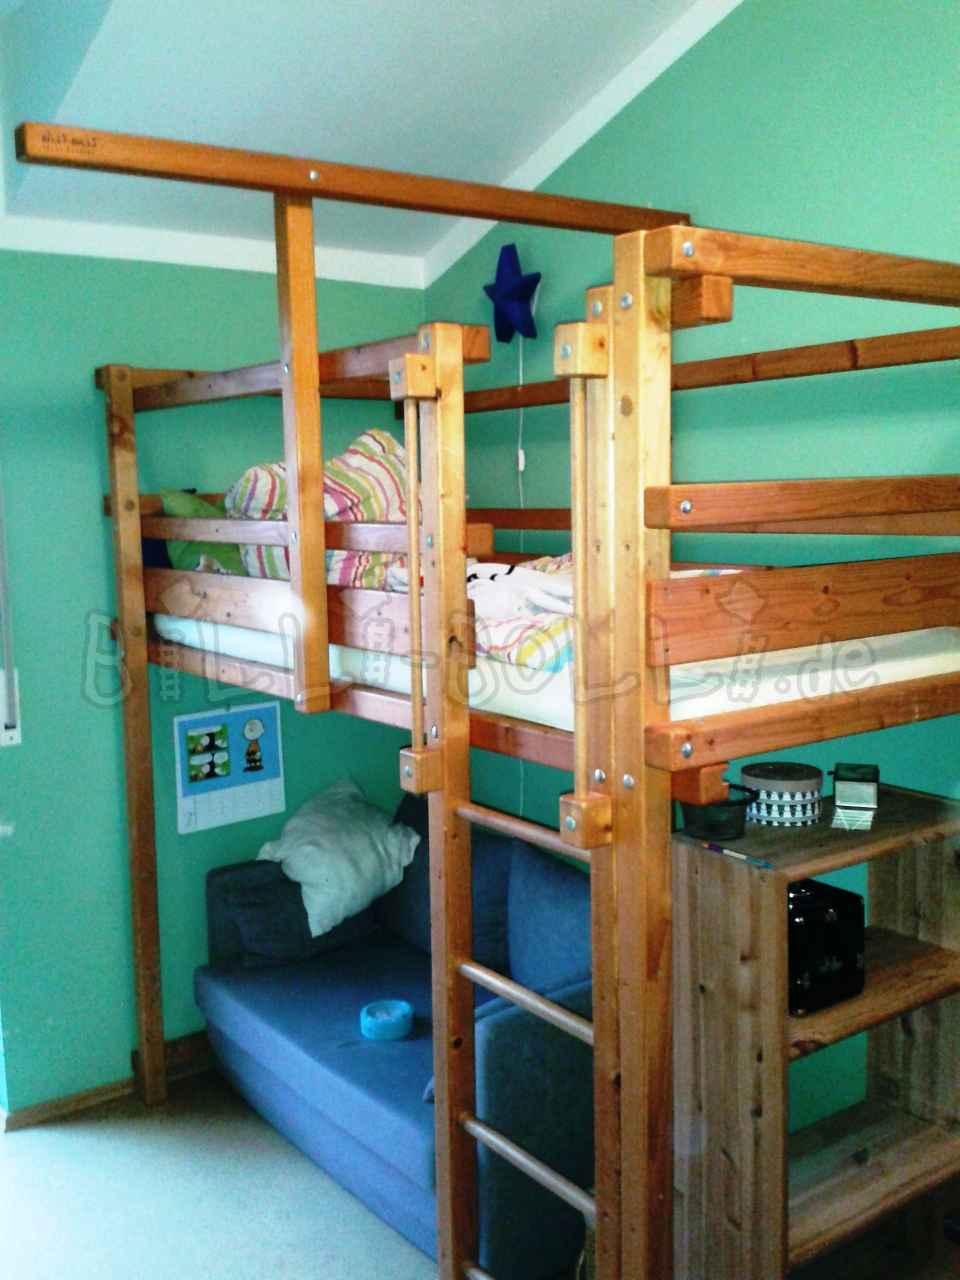 seconde main page 102 meubles pour enfants billi bolli. Black Bedroom Furniture Sets. Home Design Ideas